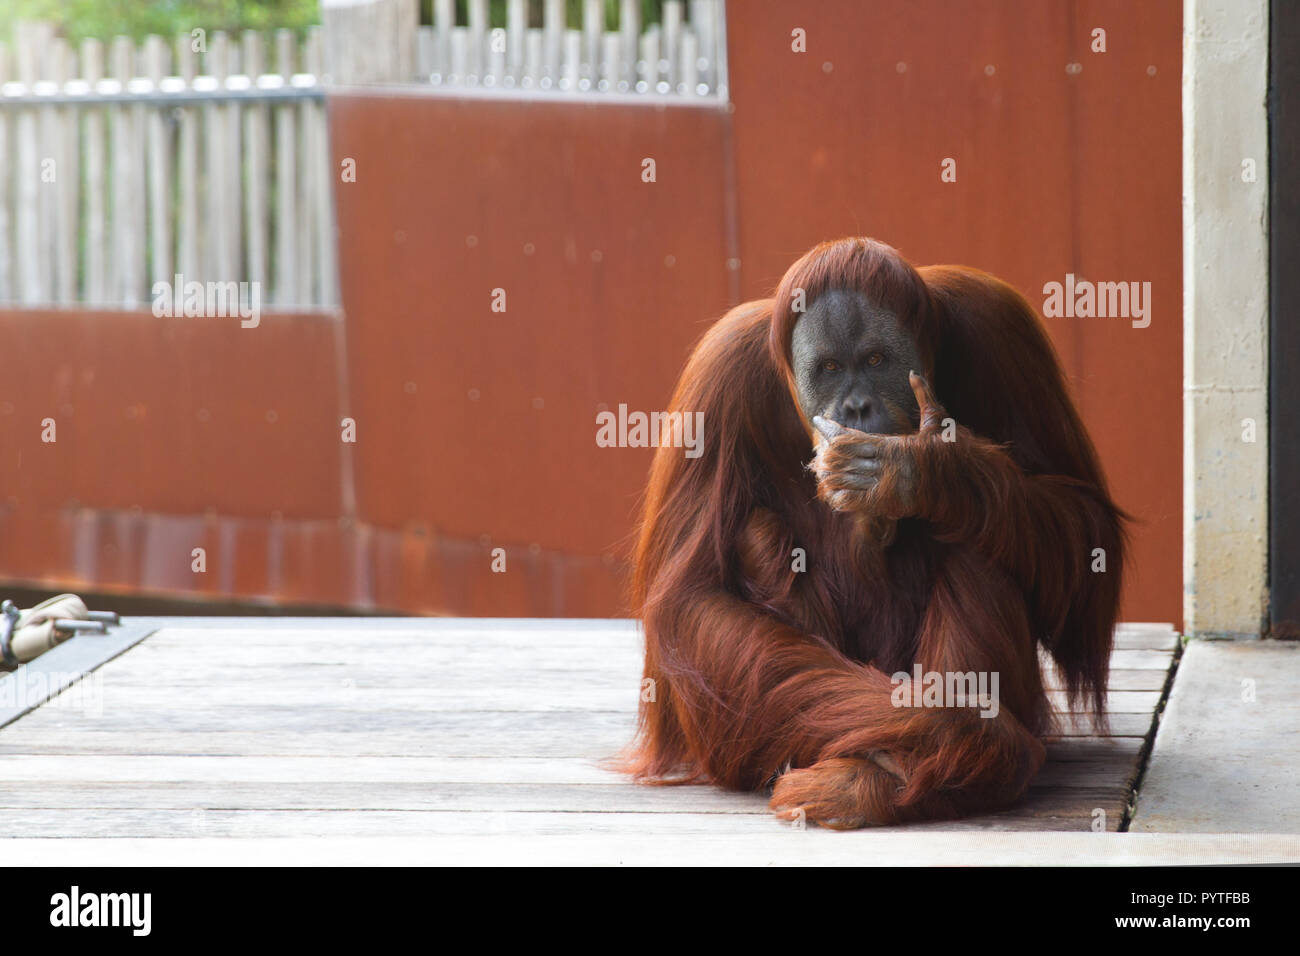 Orangutan sitting on platform, looking at the camera, thinking. - Stock Image